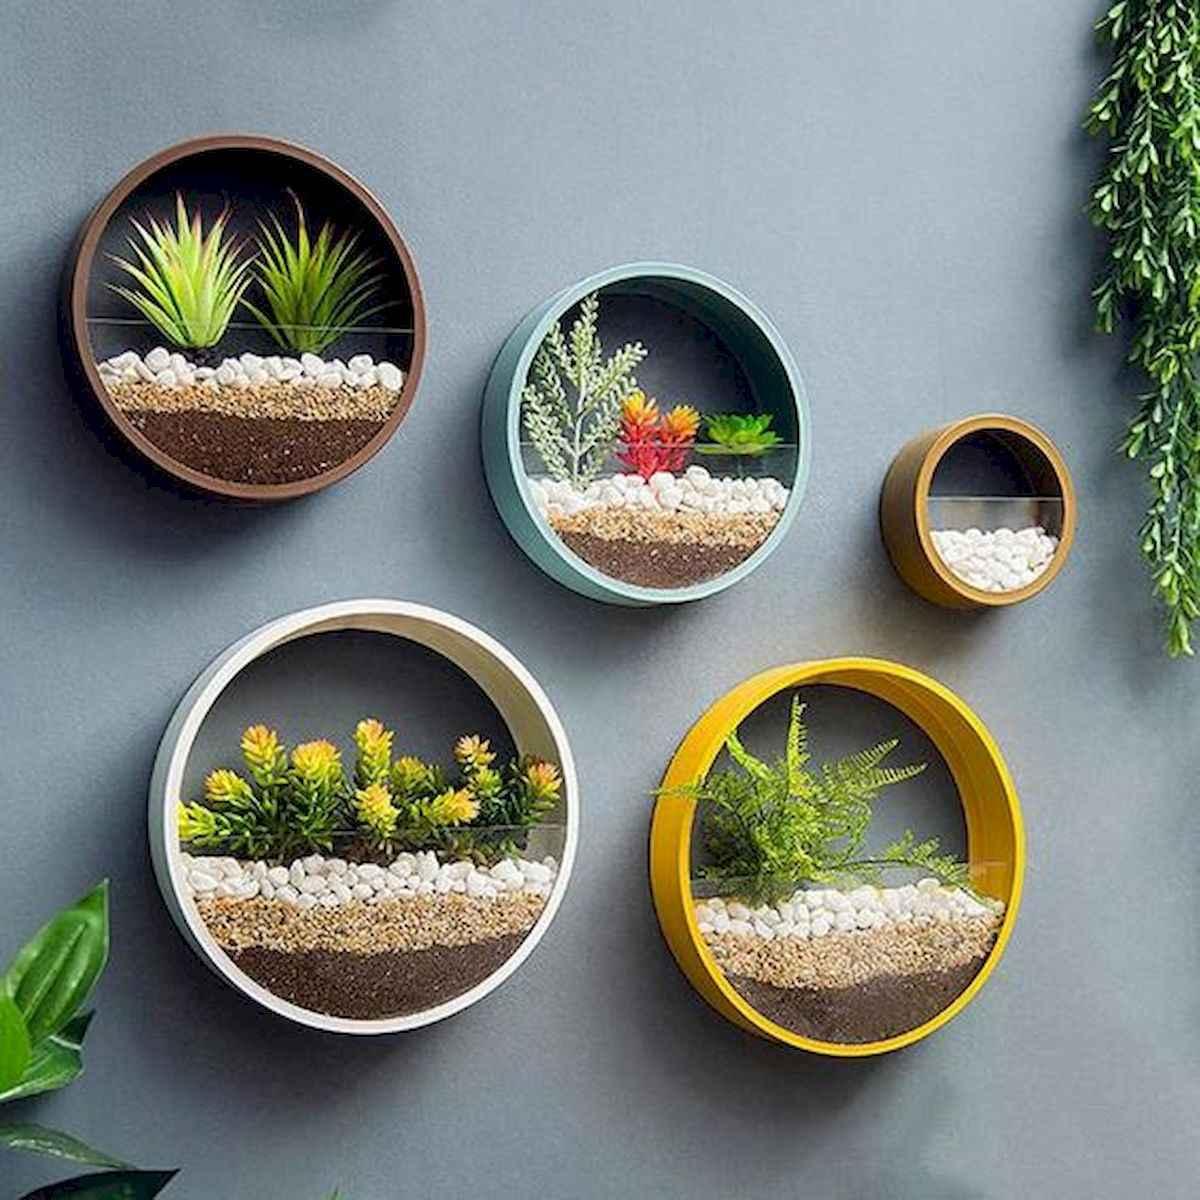 30 Amazing DIY Home Decor Dollar Store Ideas (15)